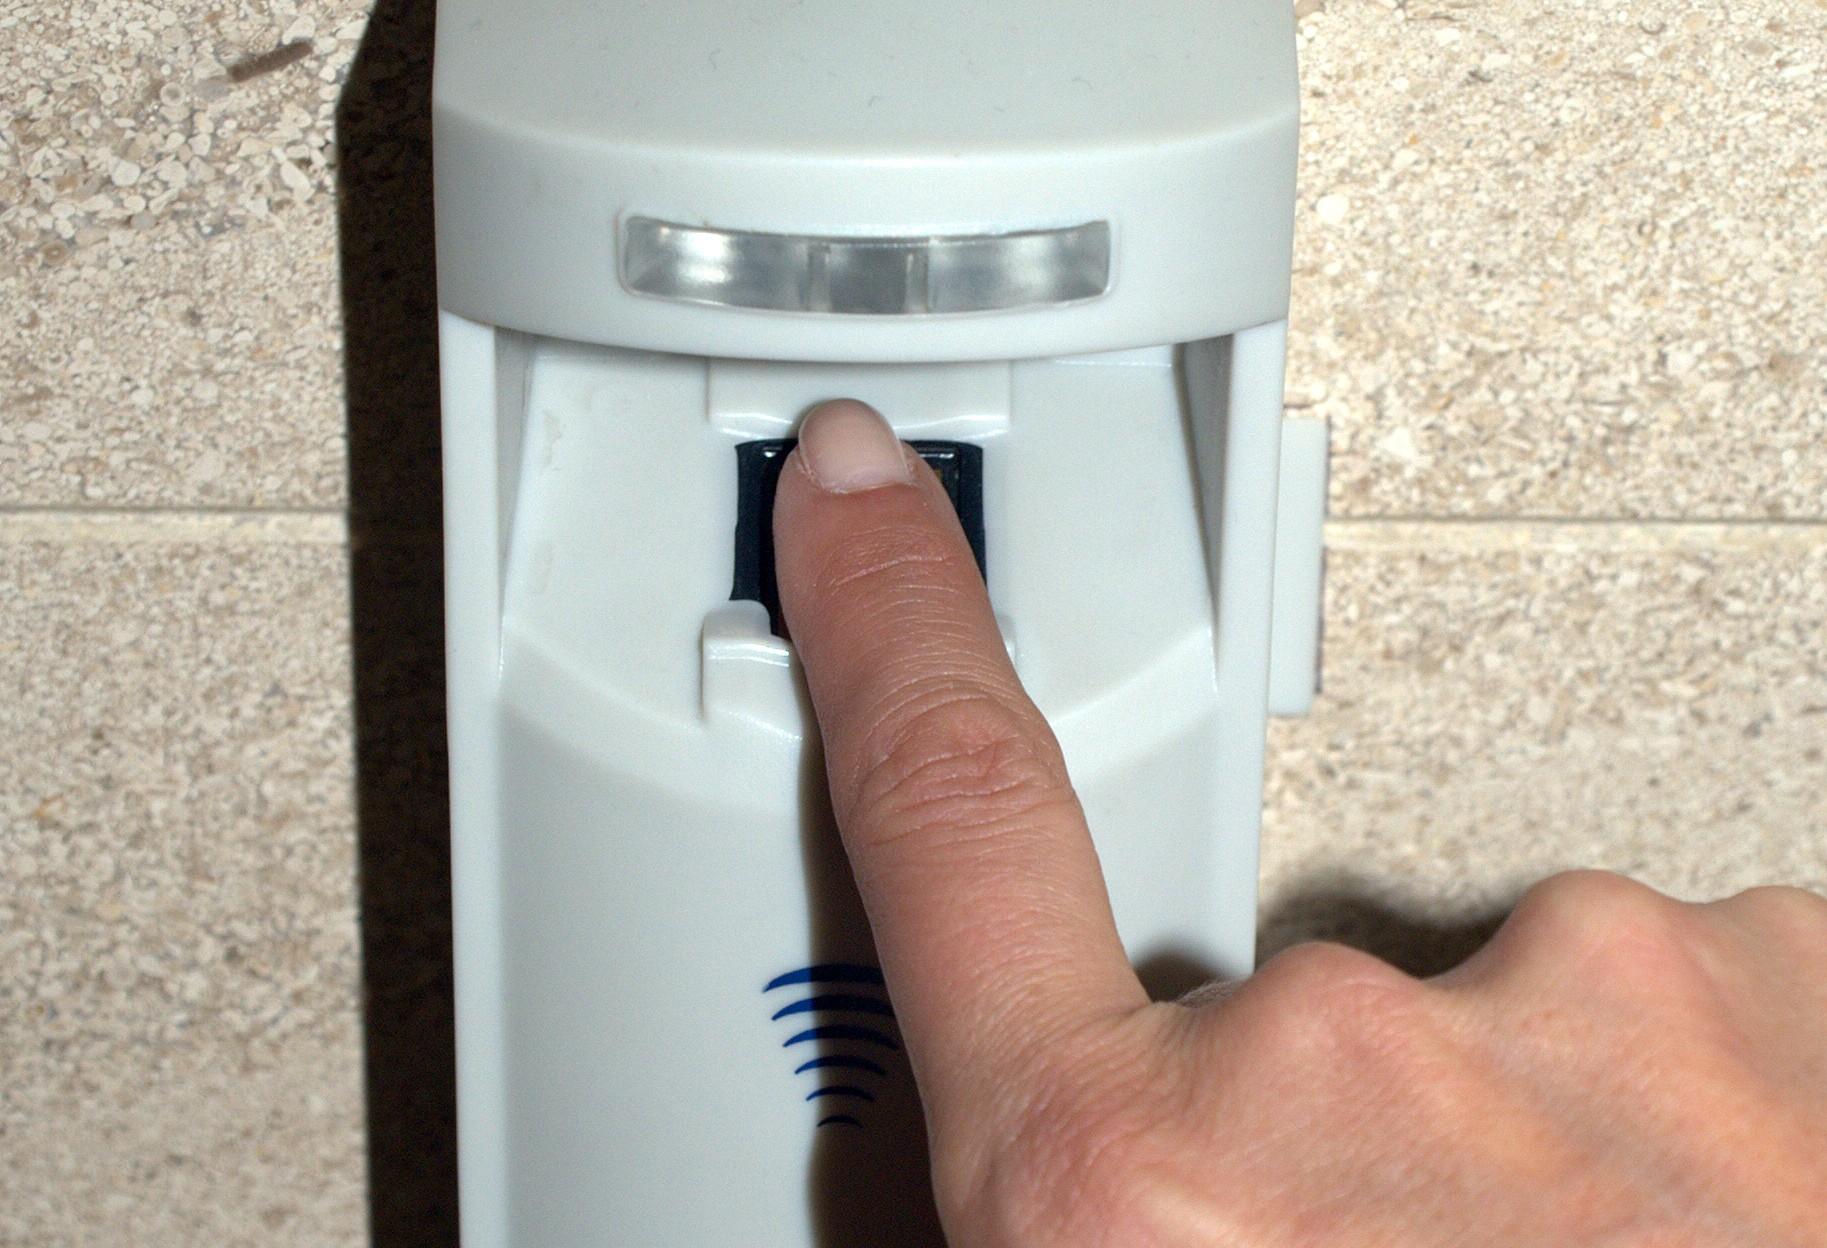 A picture of a fingerprint scanner